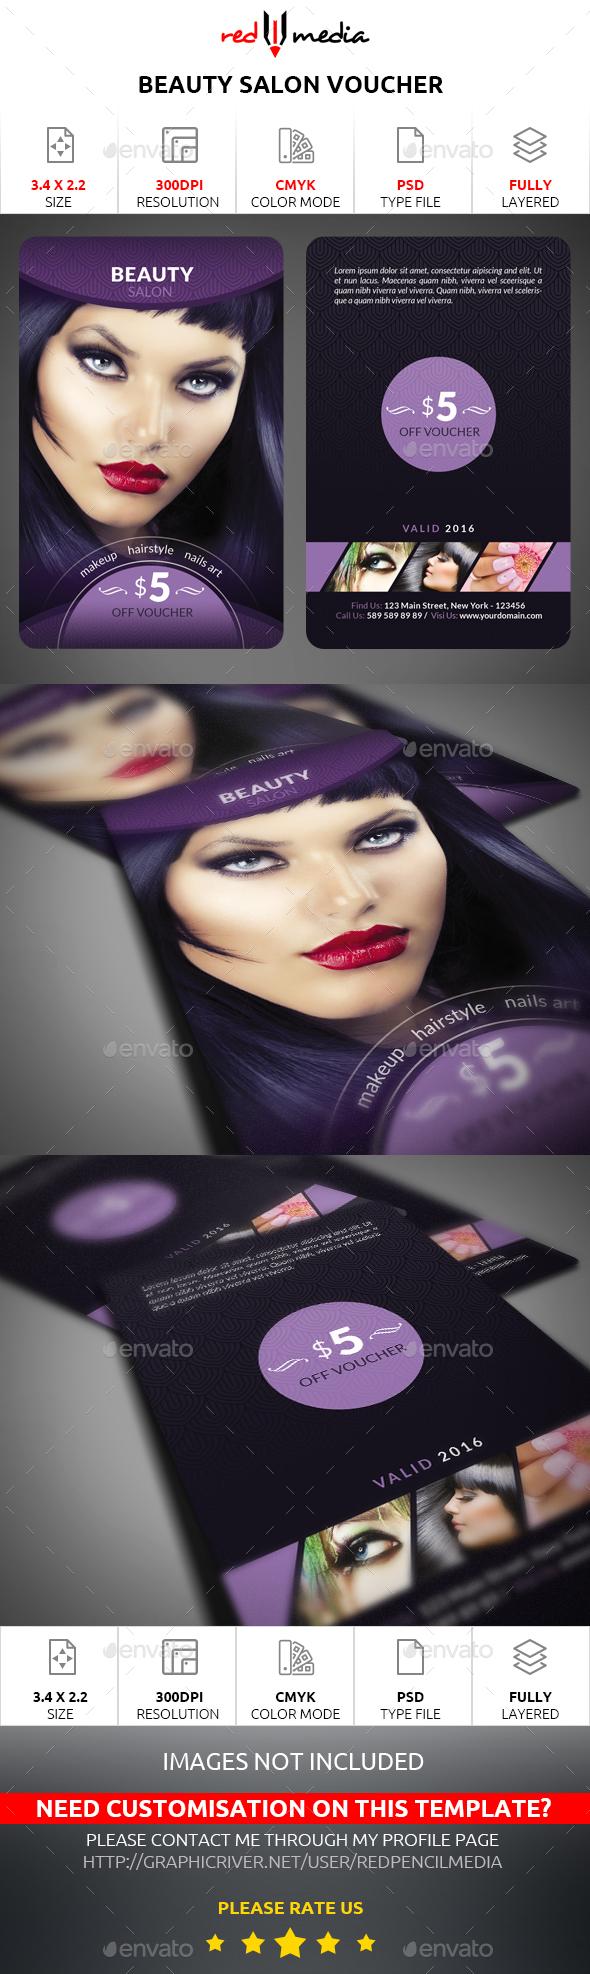 Beauty Salon Voucher Card - Loyalty Cards Cards & Invites